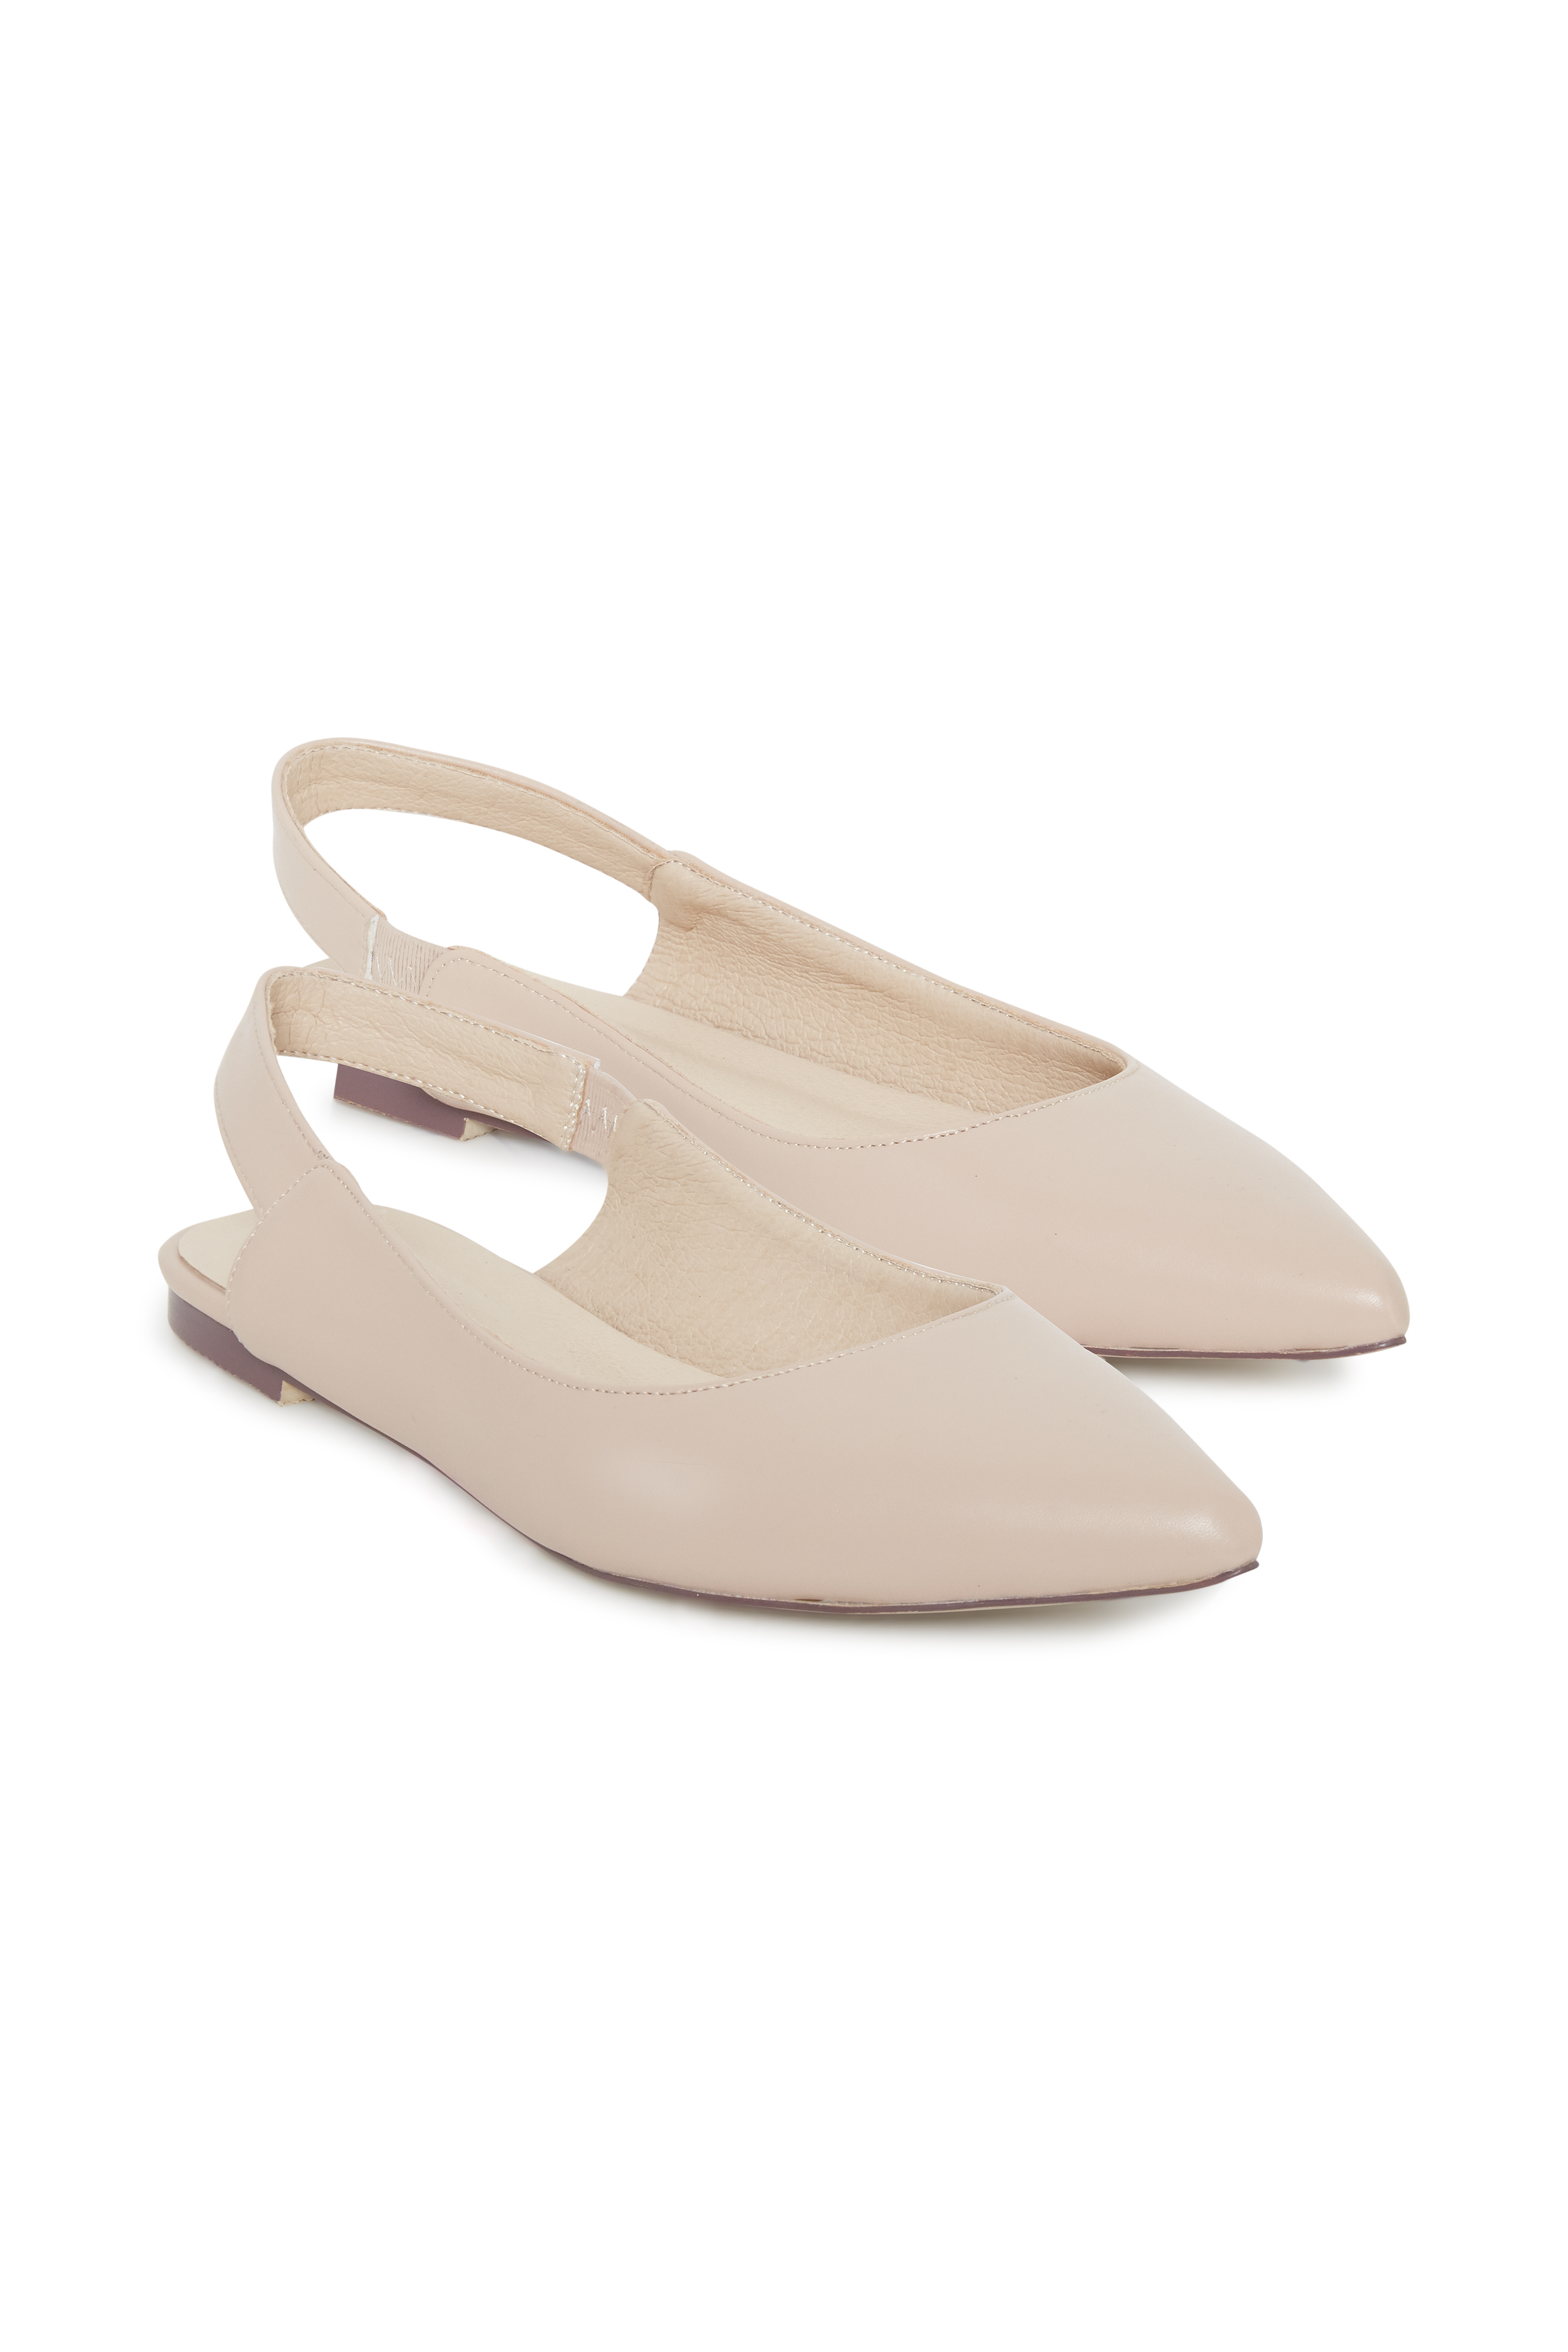 Ichi - accessories Dame Sling-back sko med spids snude  - Støvet rosa